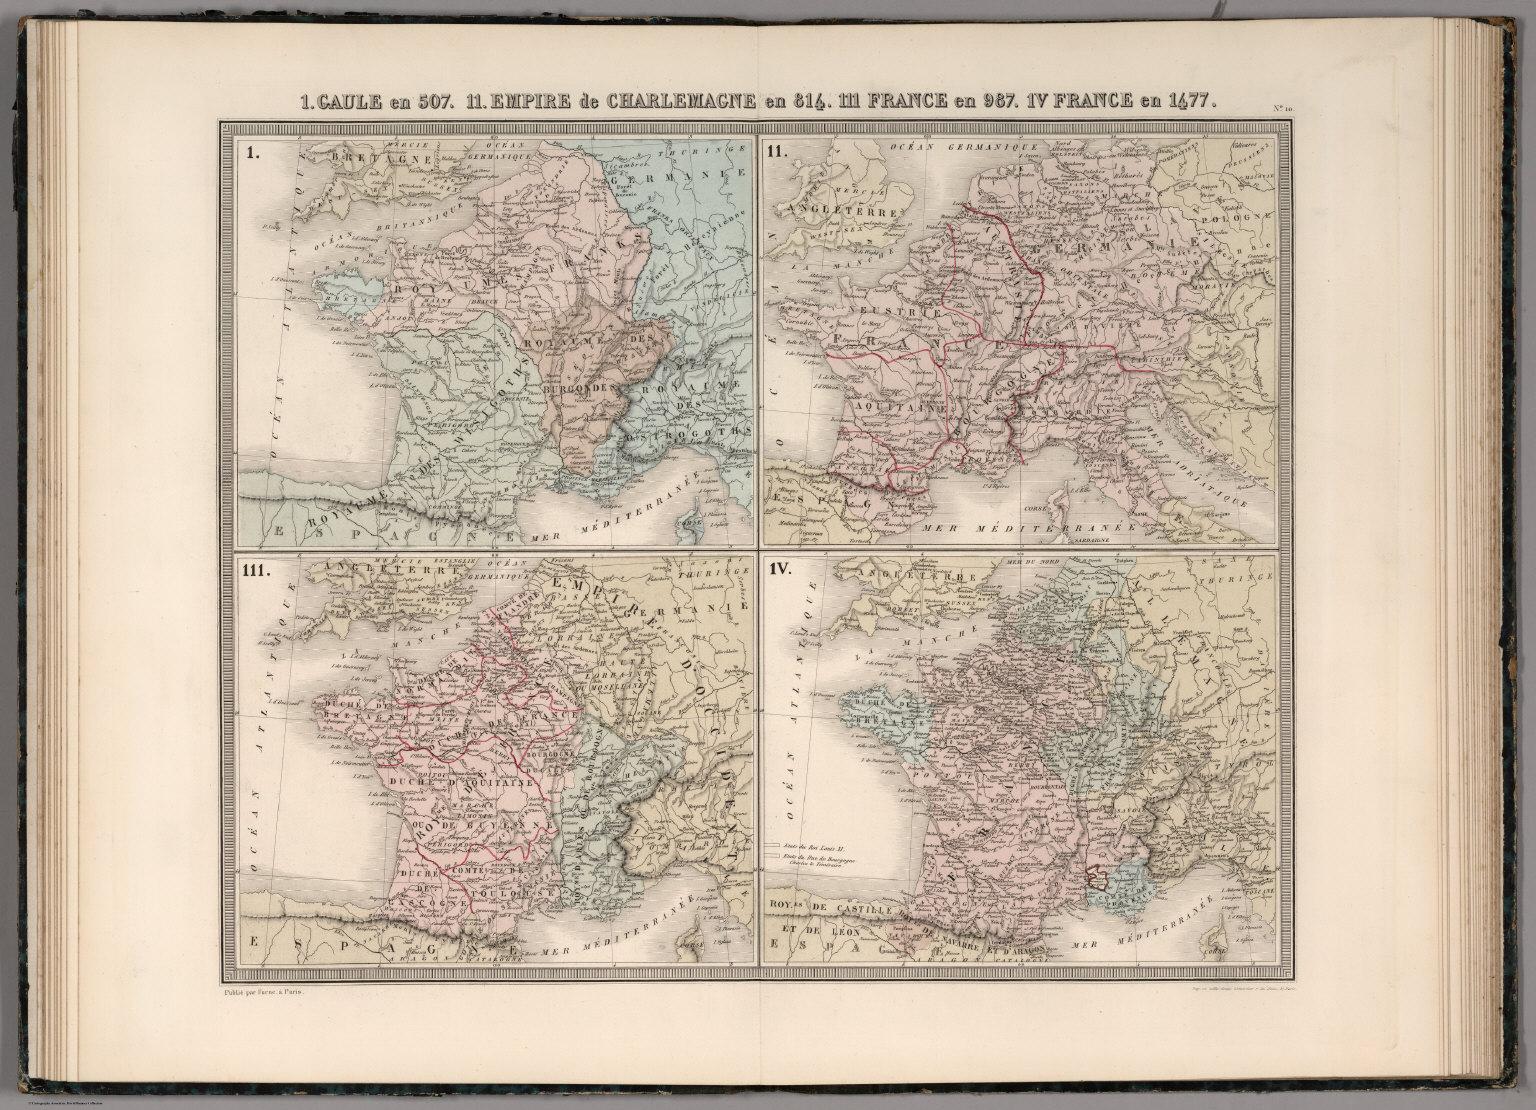 Map France 987.I Gaule En 507 Ii Empire De Charlemagne En 814 Iii France En